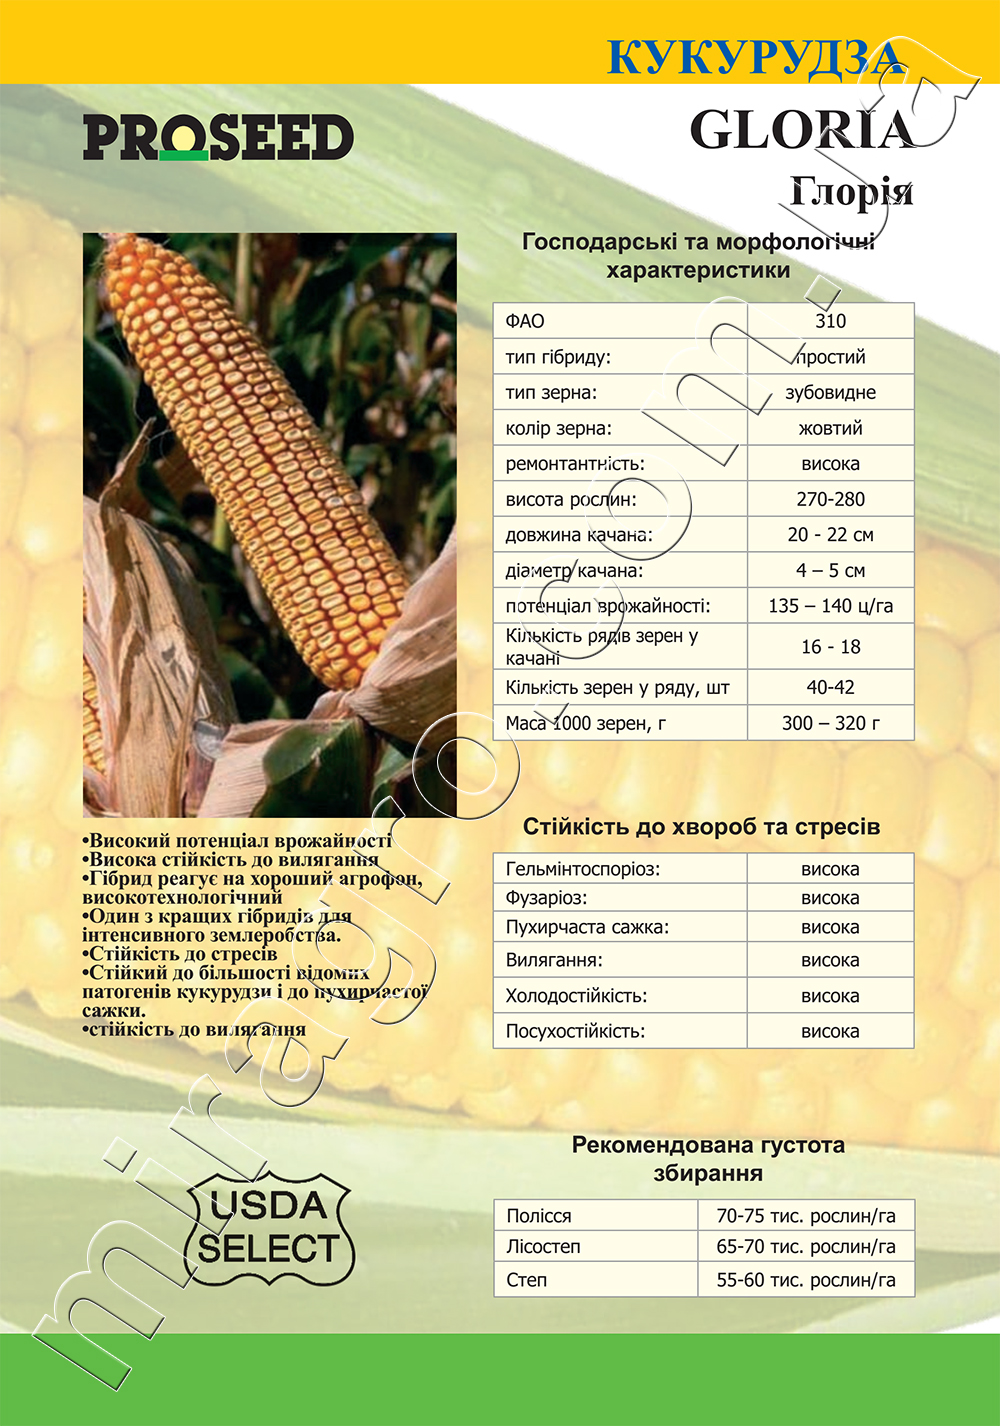 Гибрид кукурузы Глория (Gloria) - описание каталог